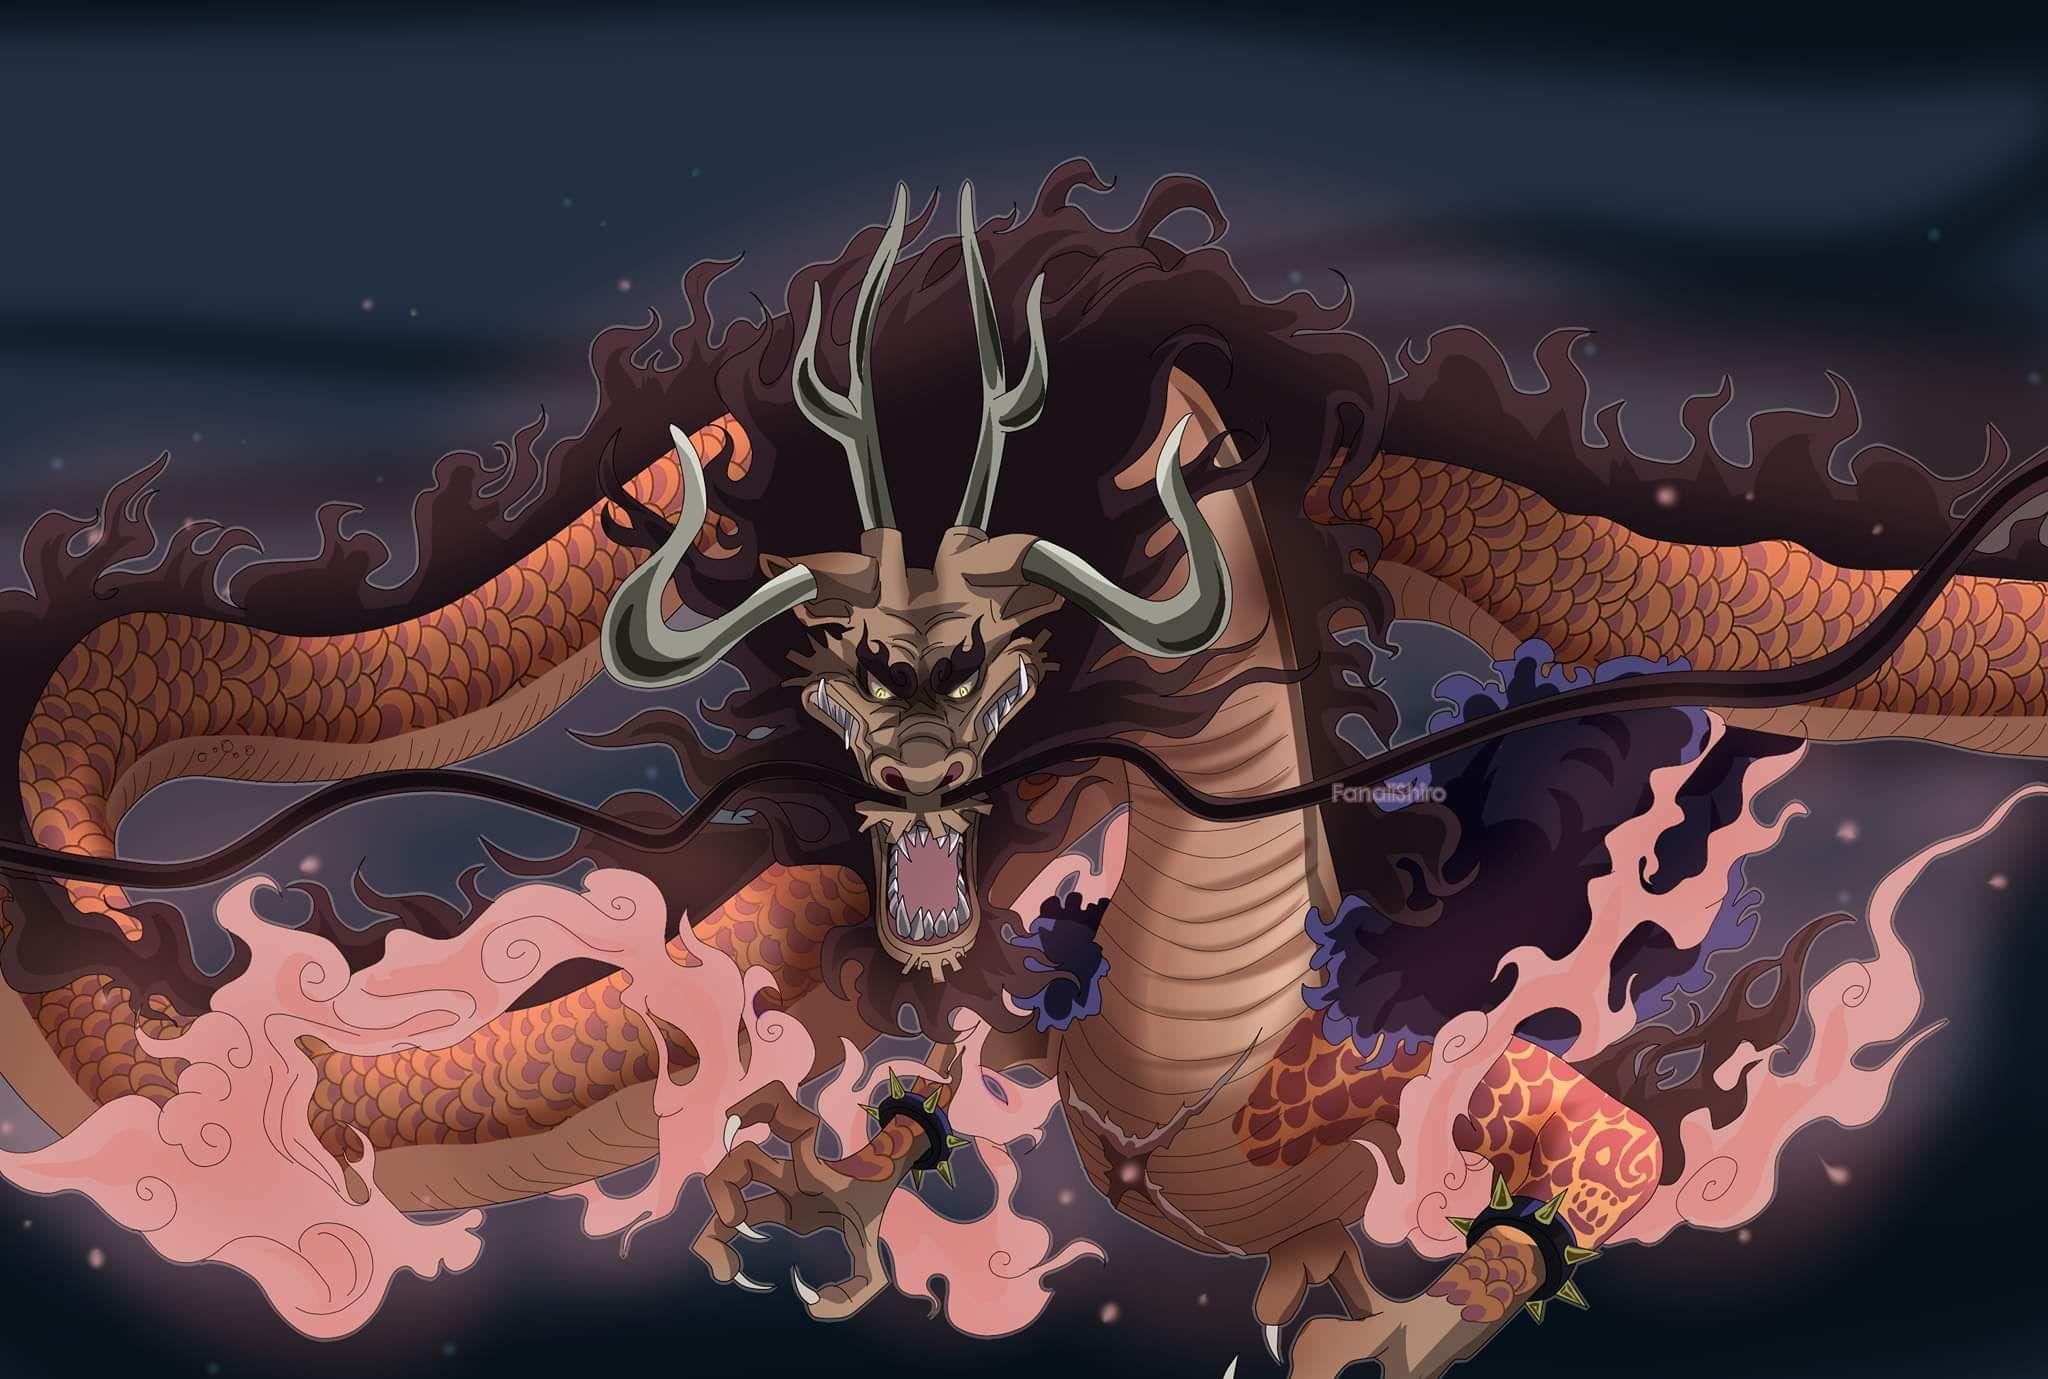 One Piece chapitre 922 Shutenmaru s'allieratil avec